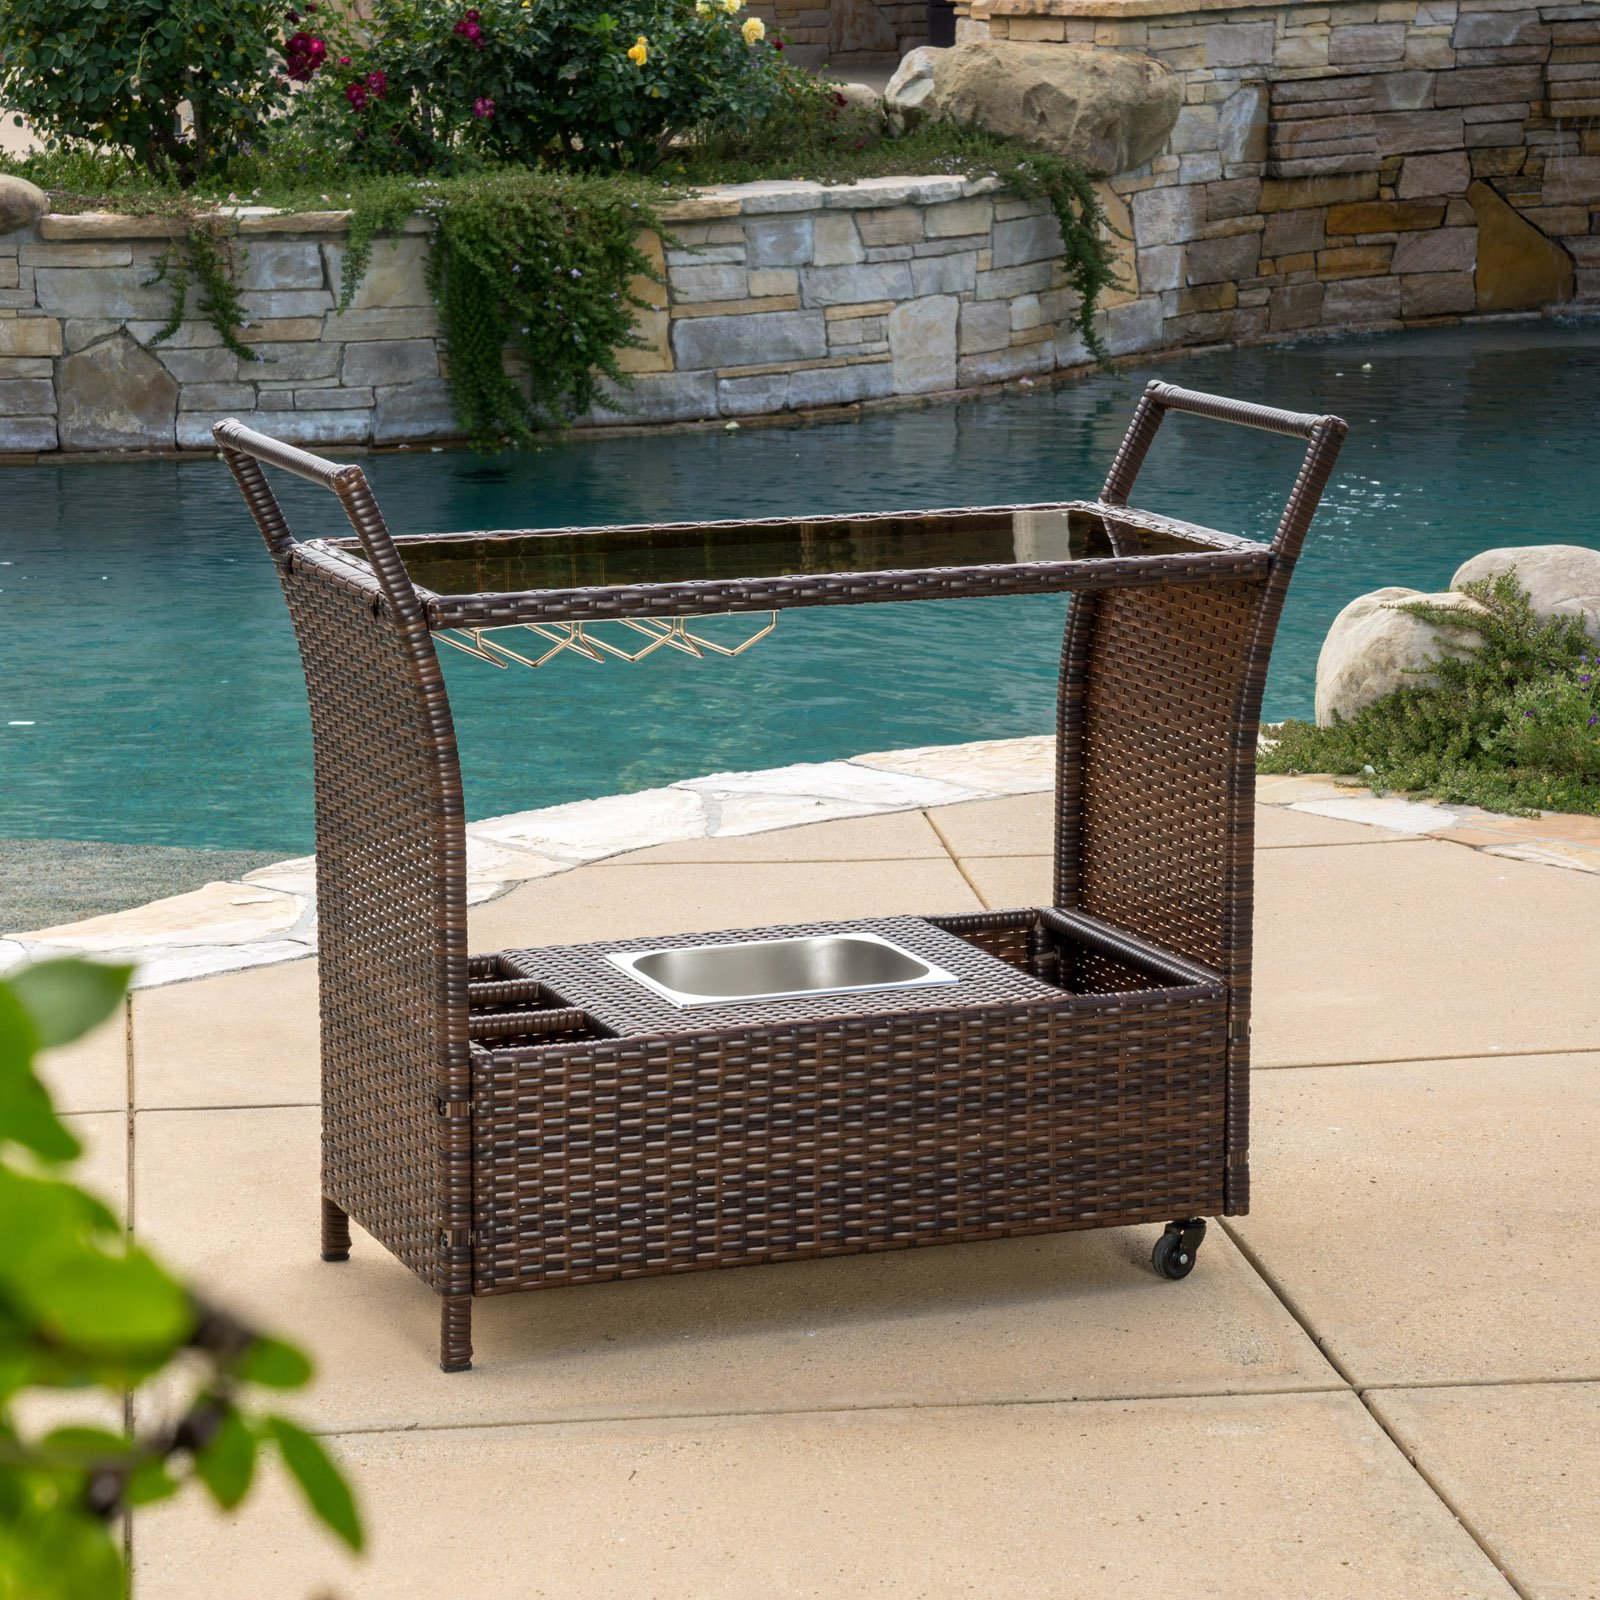 Douglas Serving Cart by Best Selling Home Decor Furniture LLC